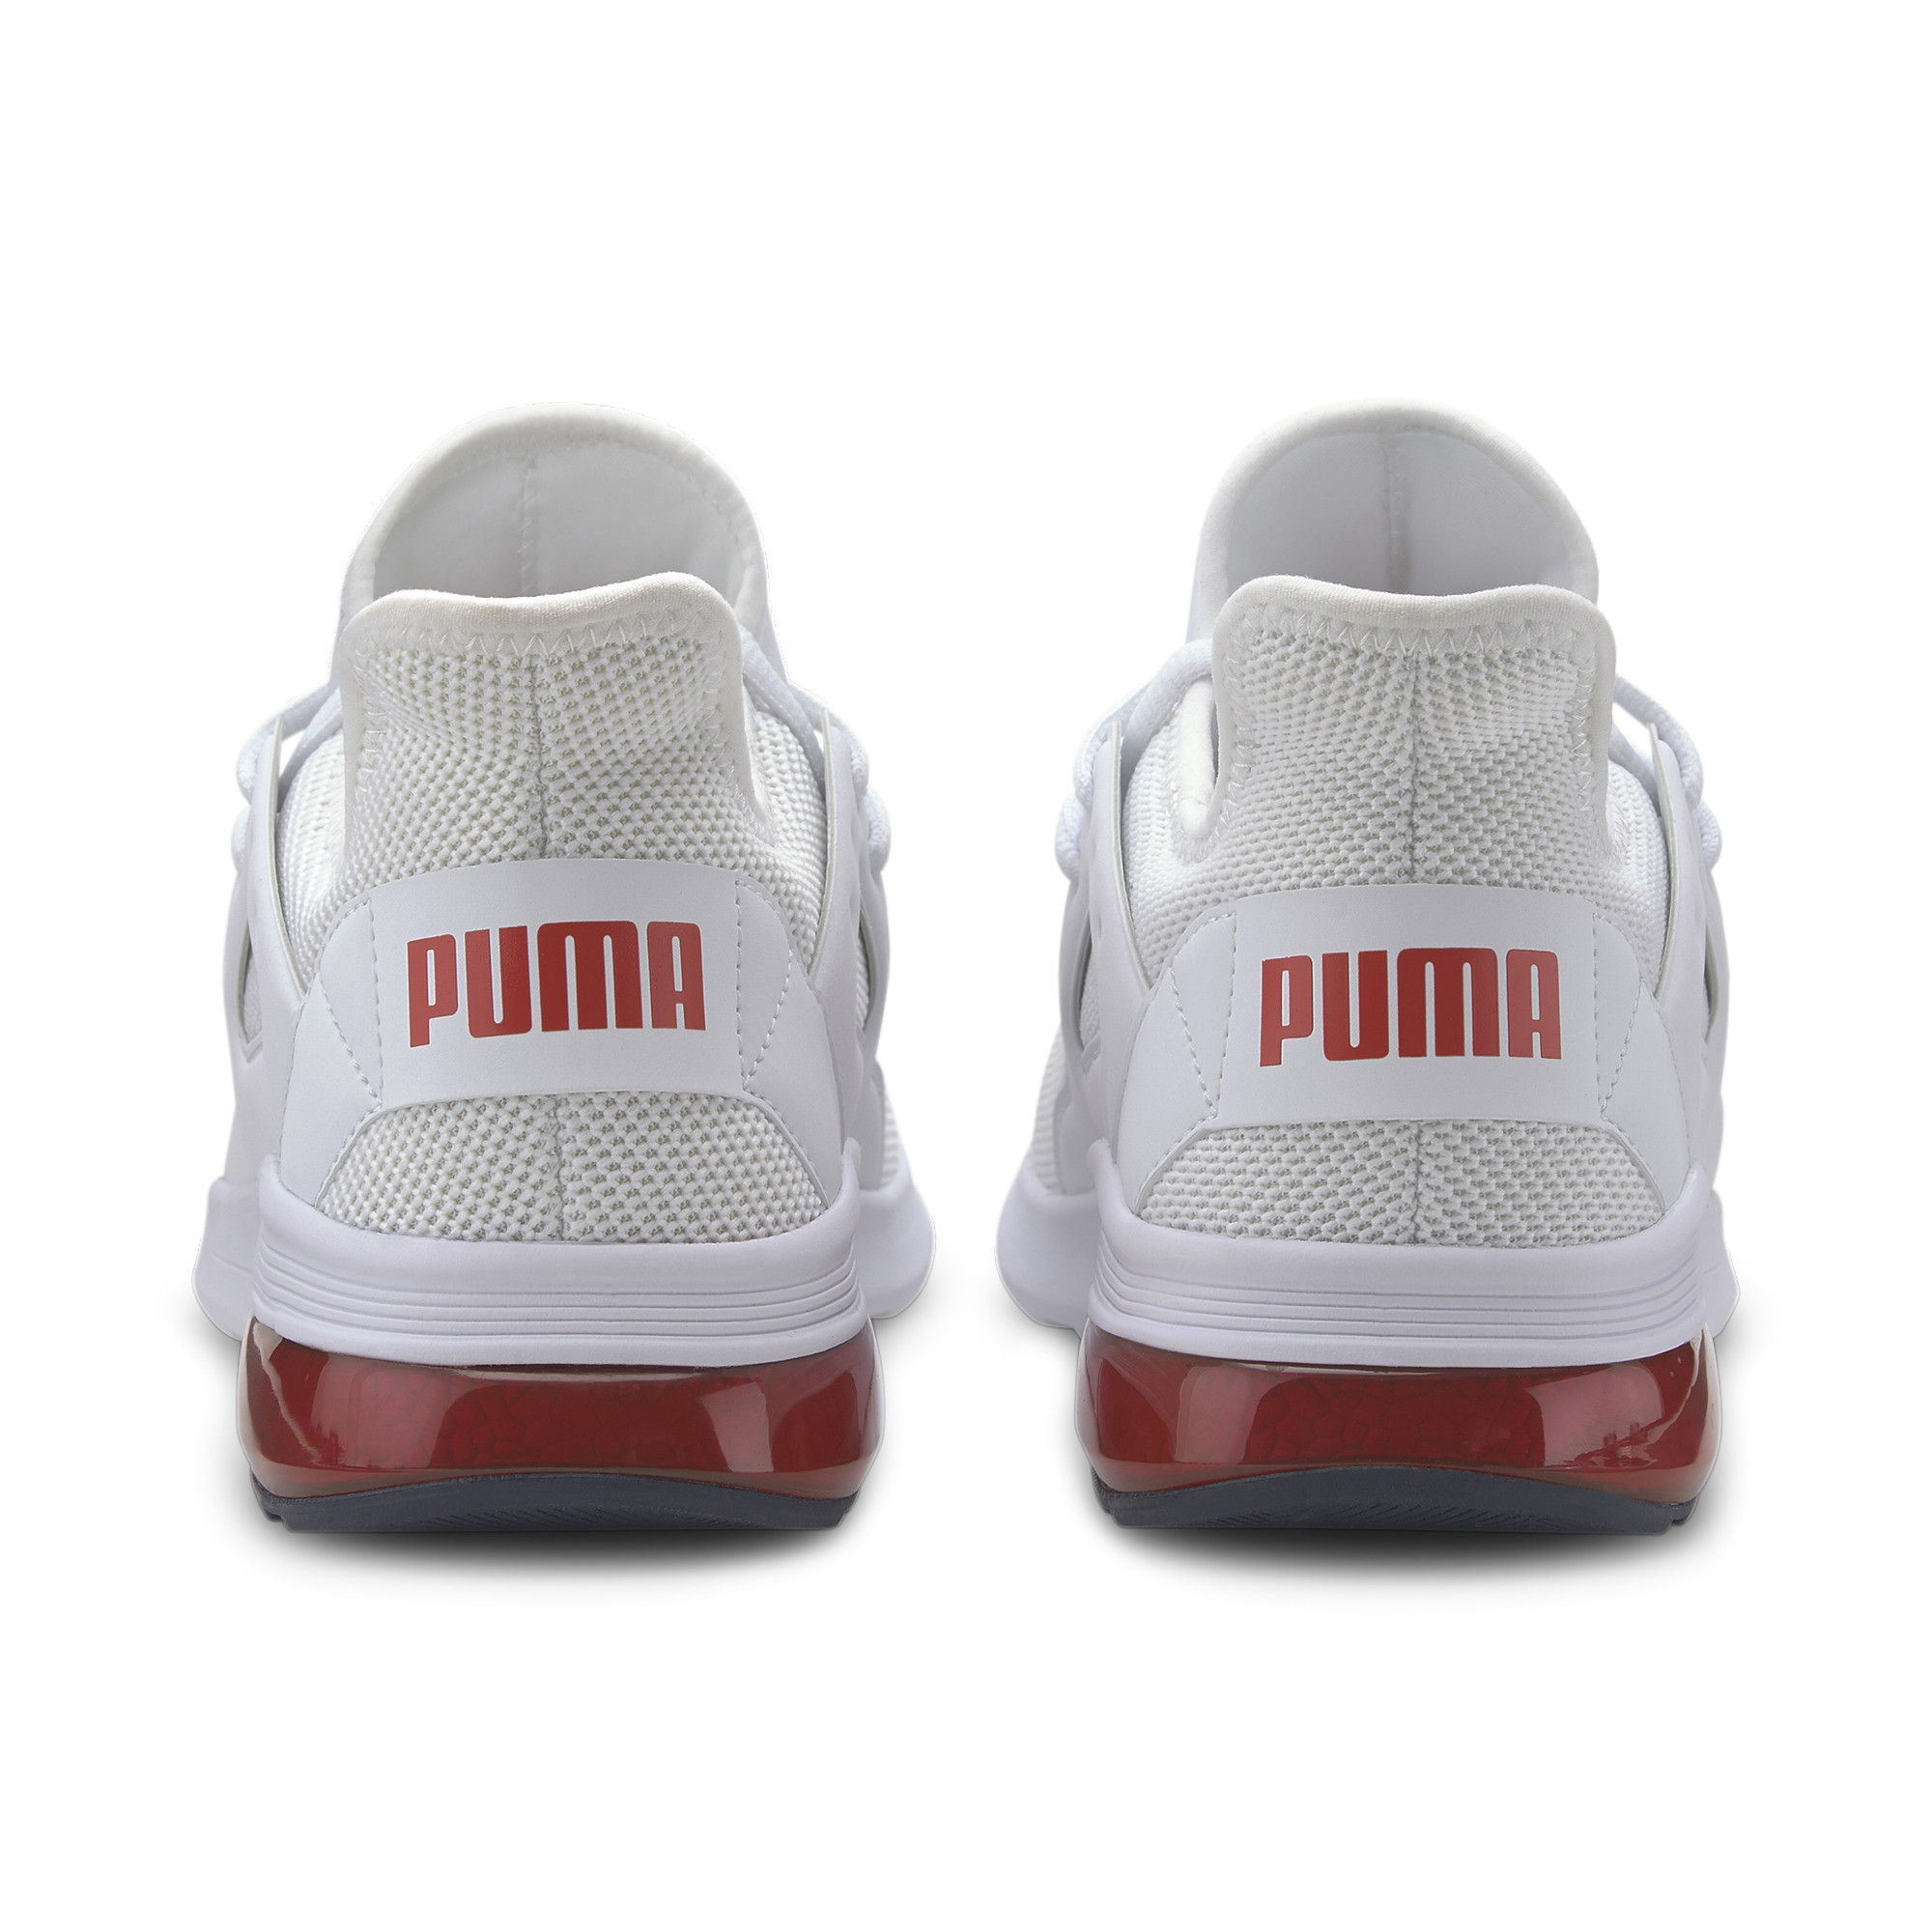 PUMA-Men-039-s-Electron-Street-Sneakers thumbnail 13